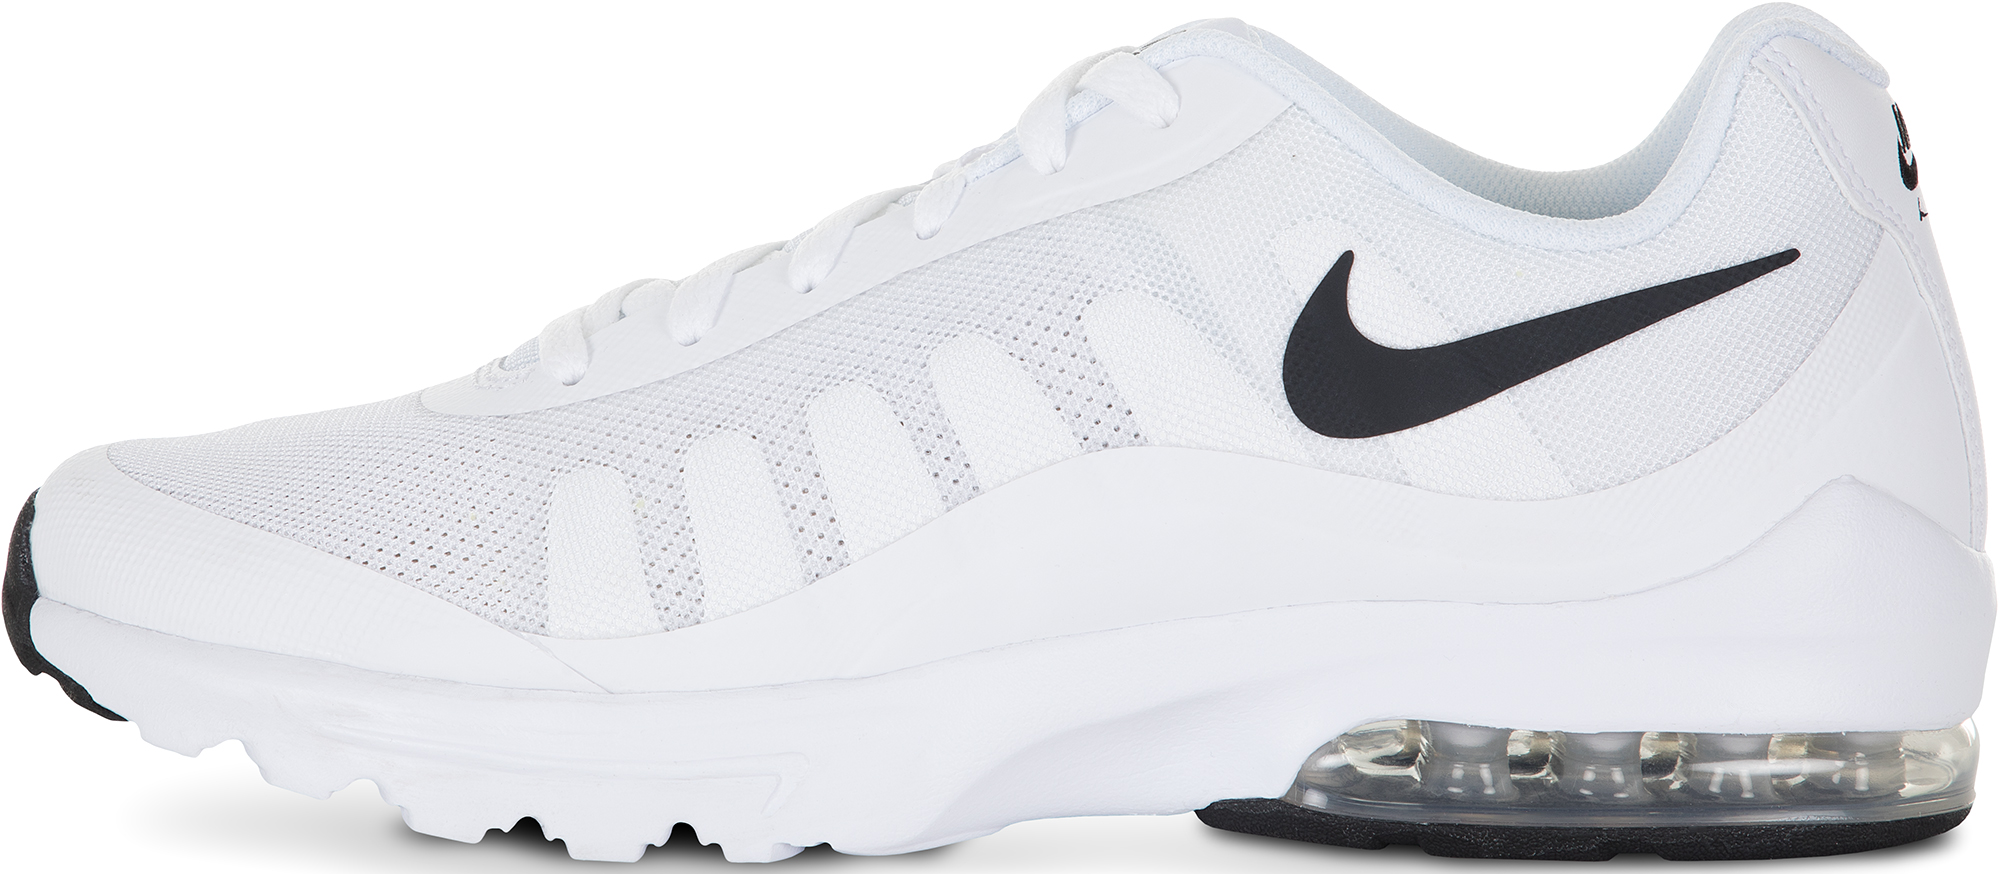 Nike Кроссовки мужские Air Max Invigor, размер 44